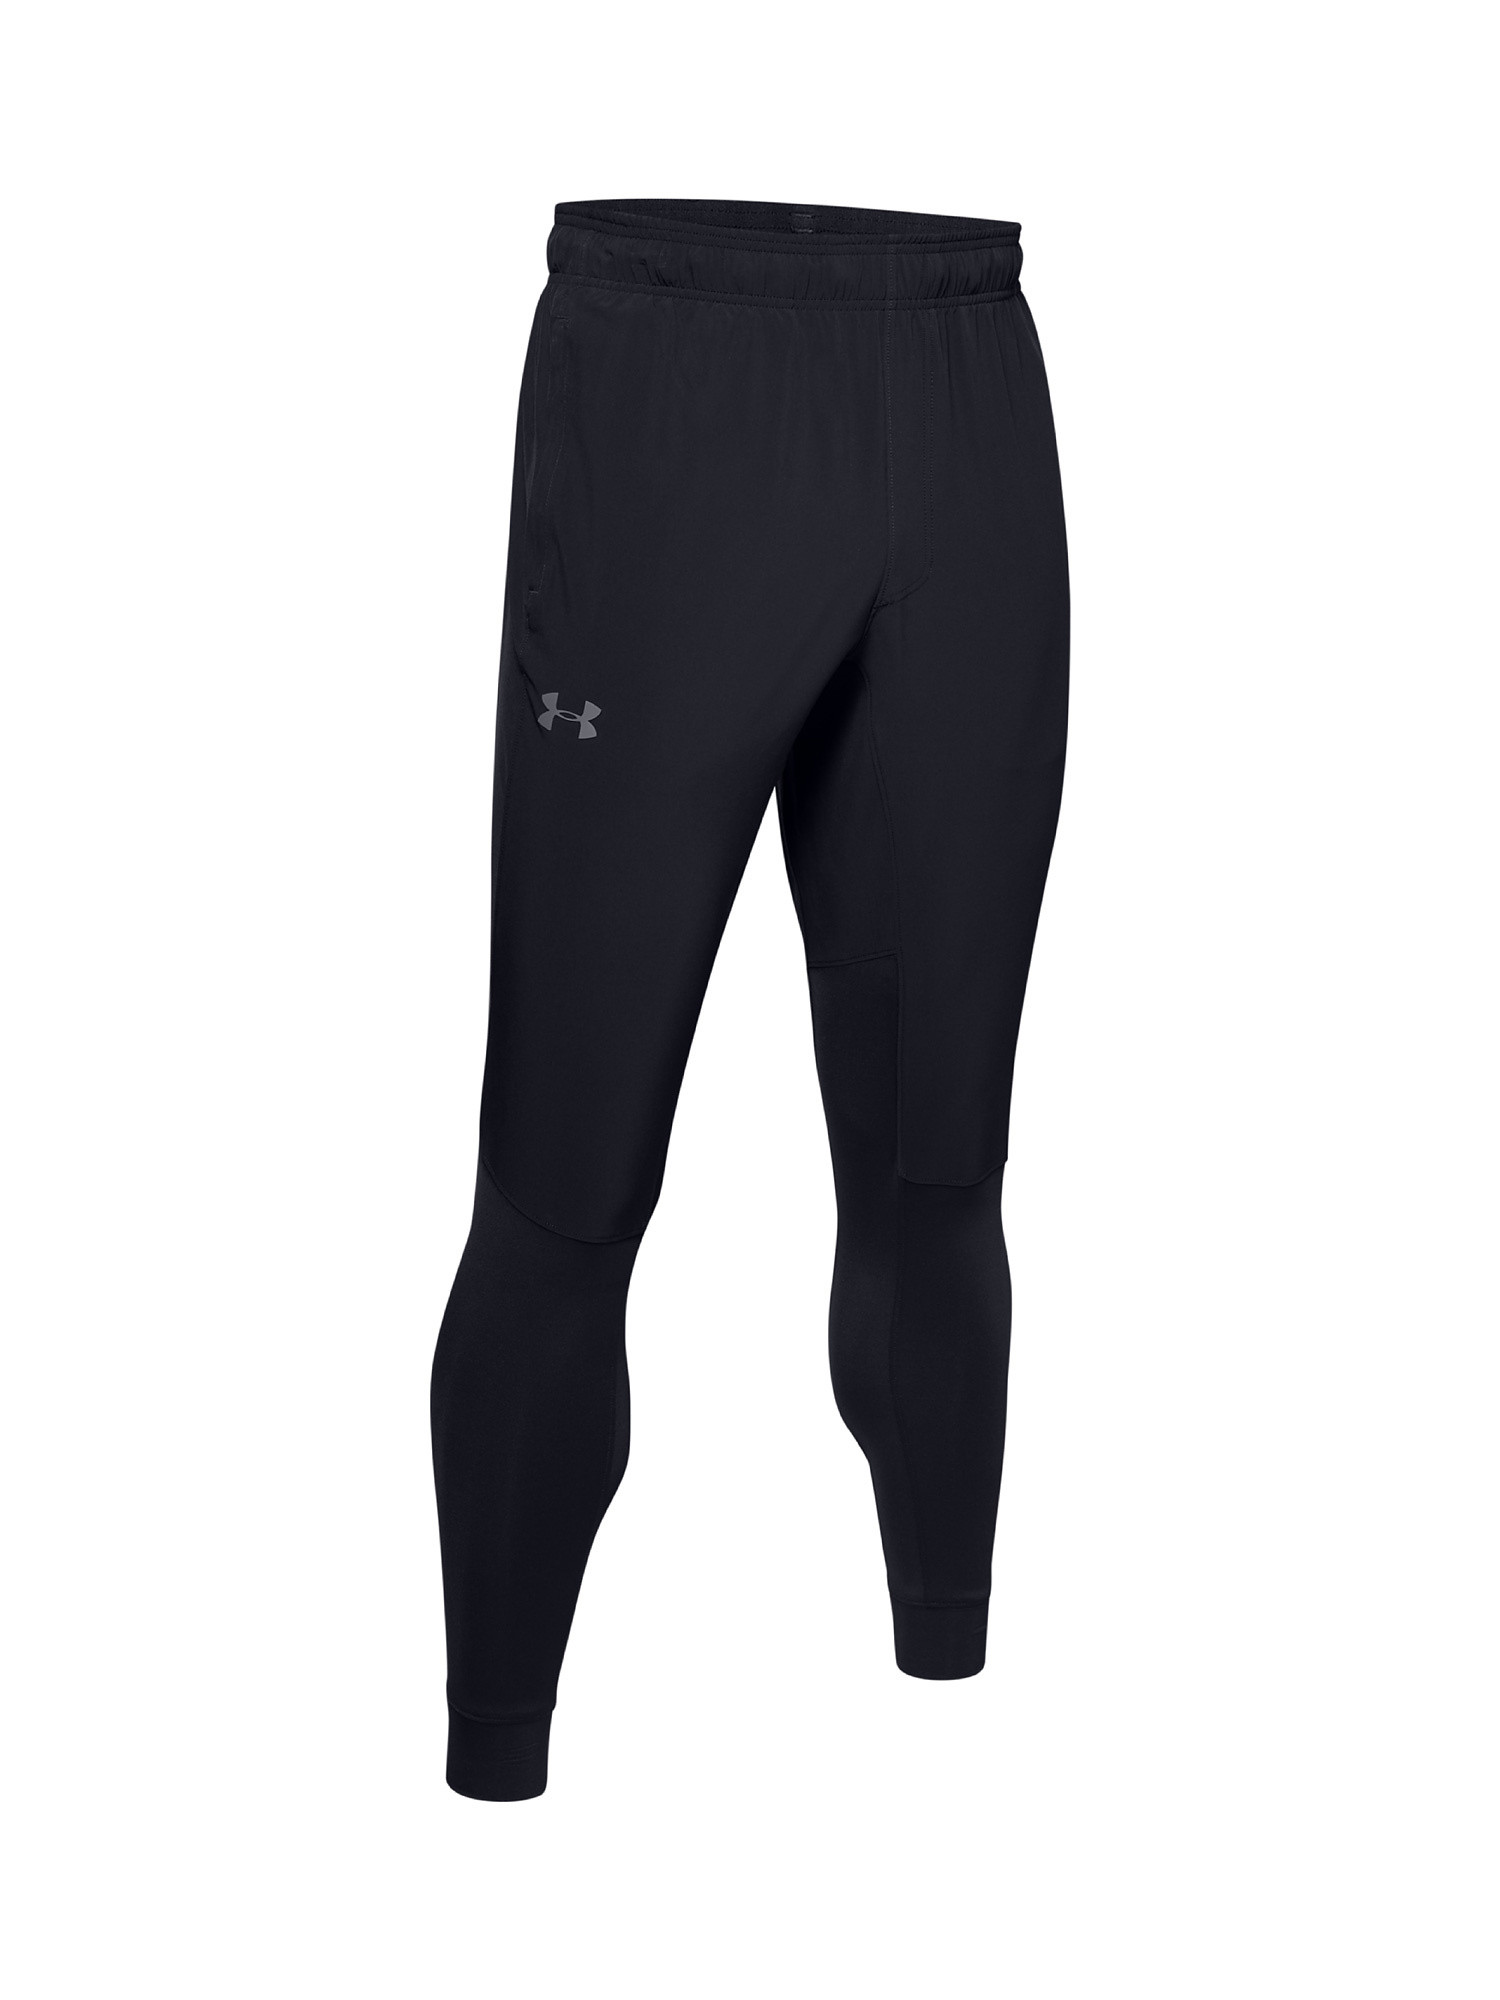 Pantaloni sportivi, Nero, large image number 0